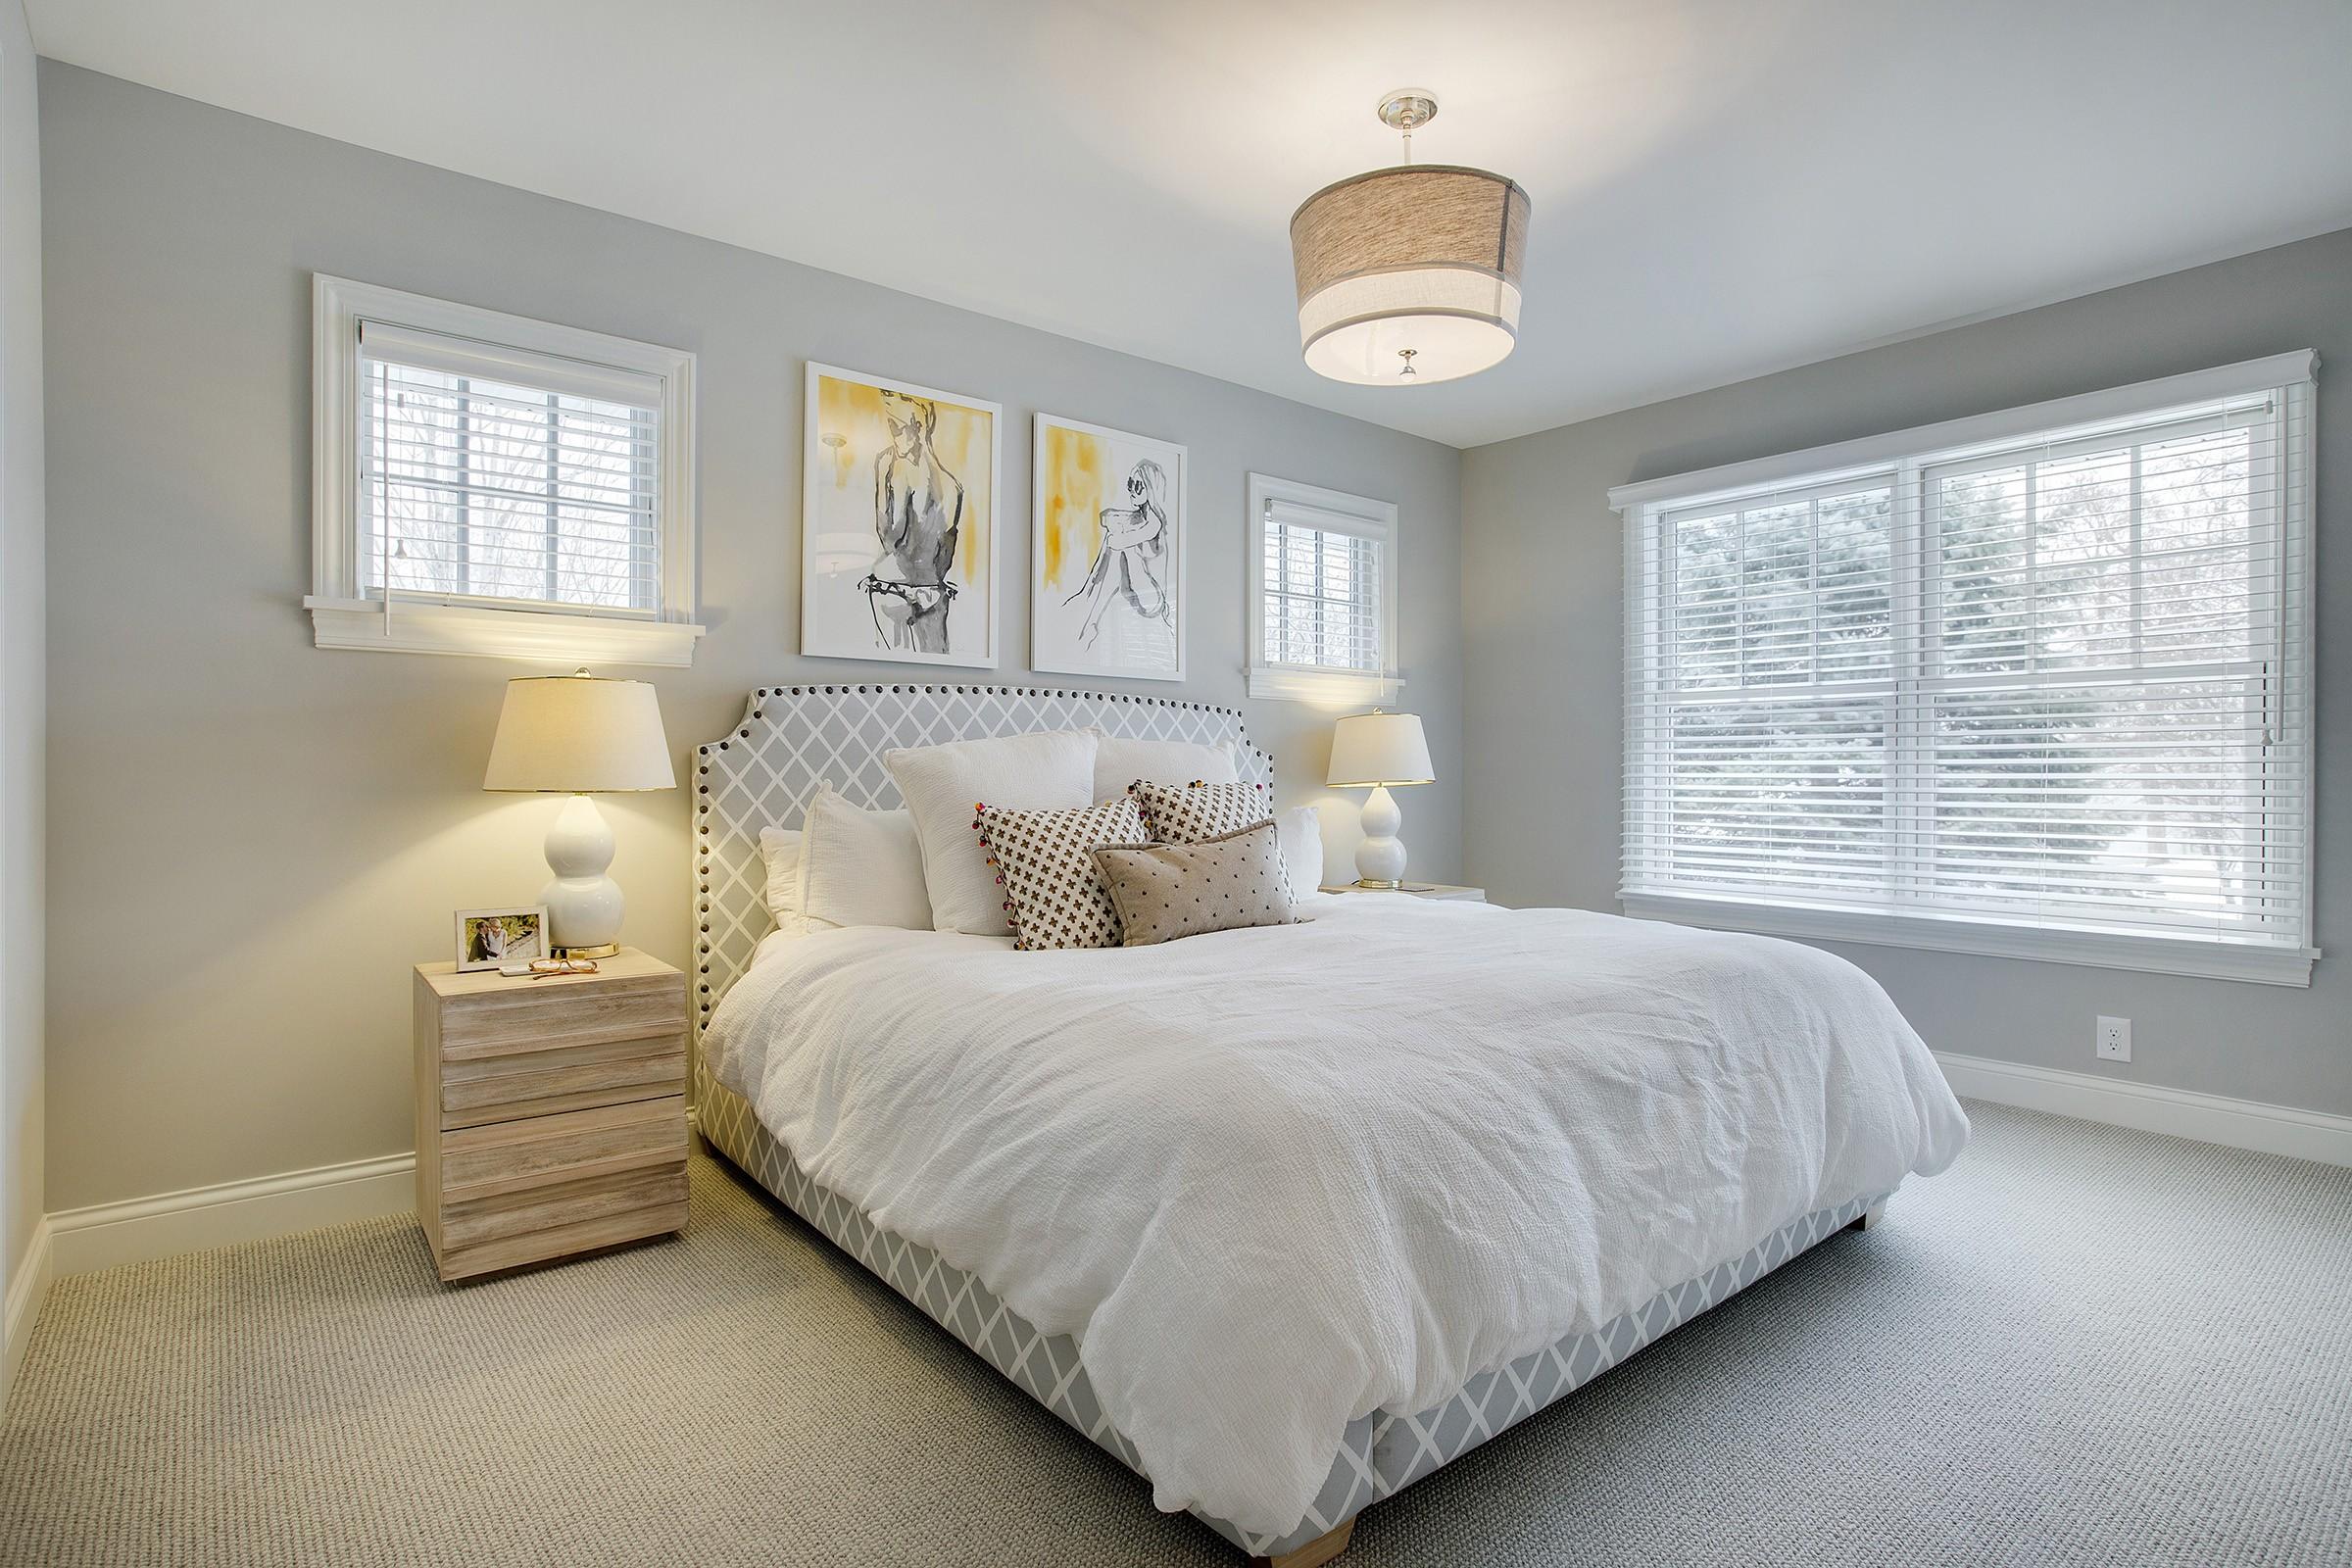 Master Bedroom Remodel- Revision LLC